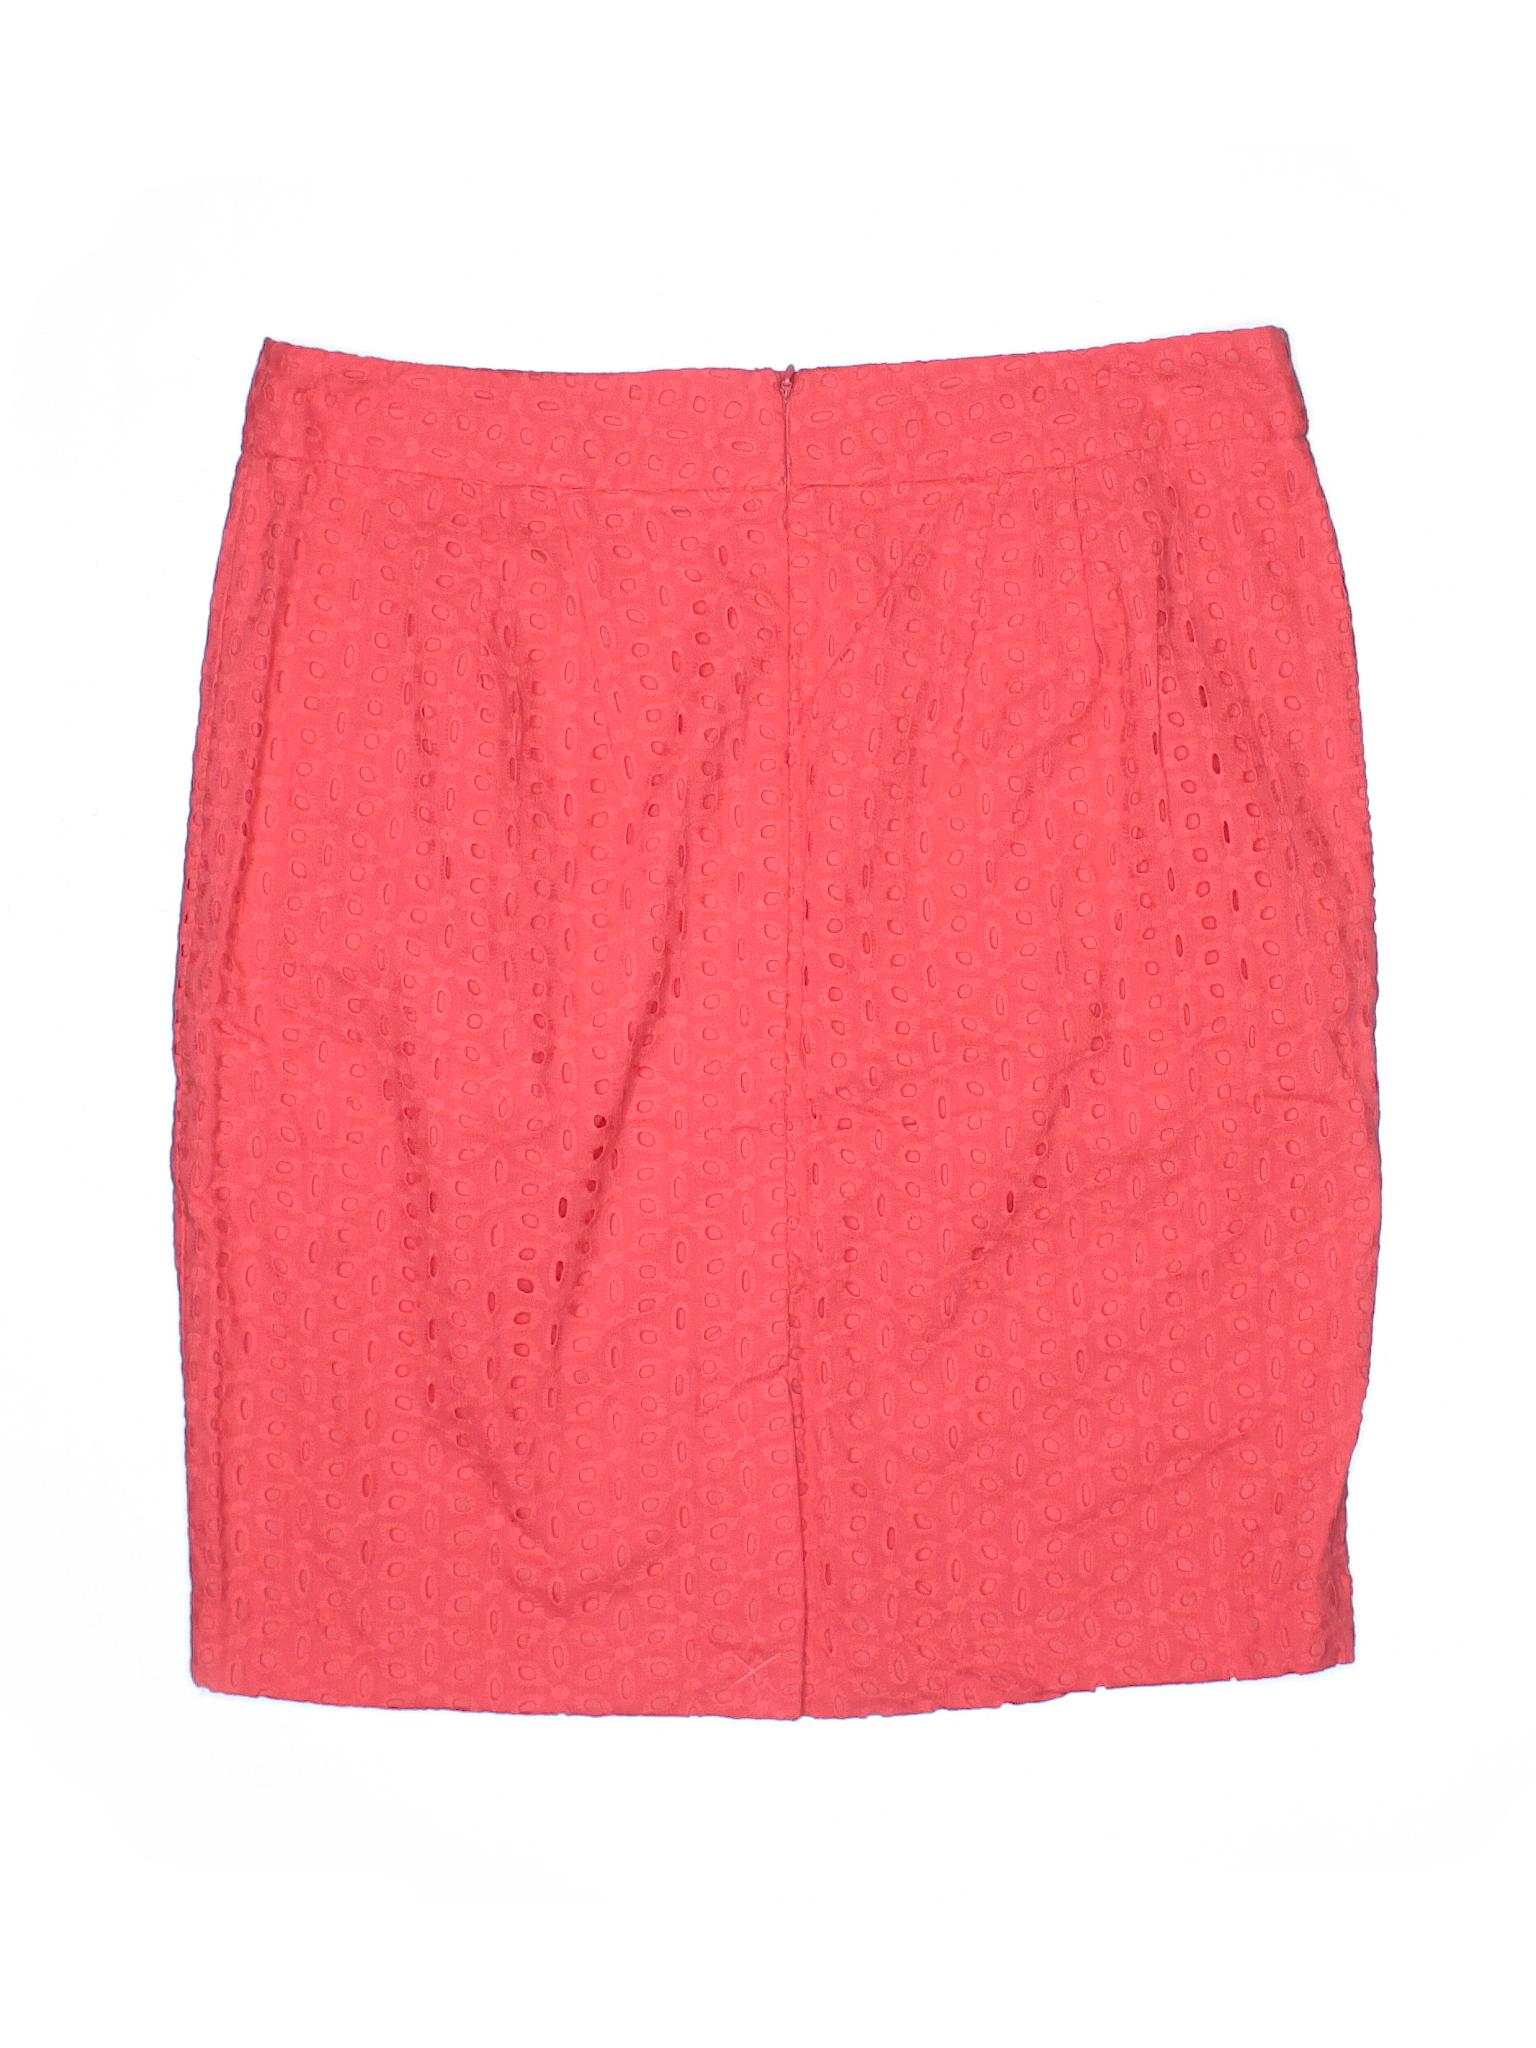 Casual Casual Casual Skirt Boutique Casual Skirt Boutique Casual Skirt Skirt Skirt Boutique Boutique Casual Boutique Boutique wpzqaRxn